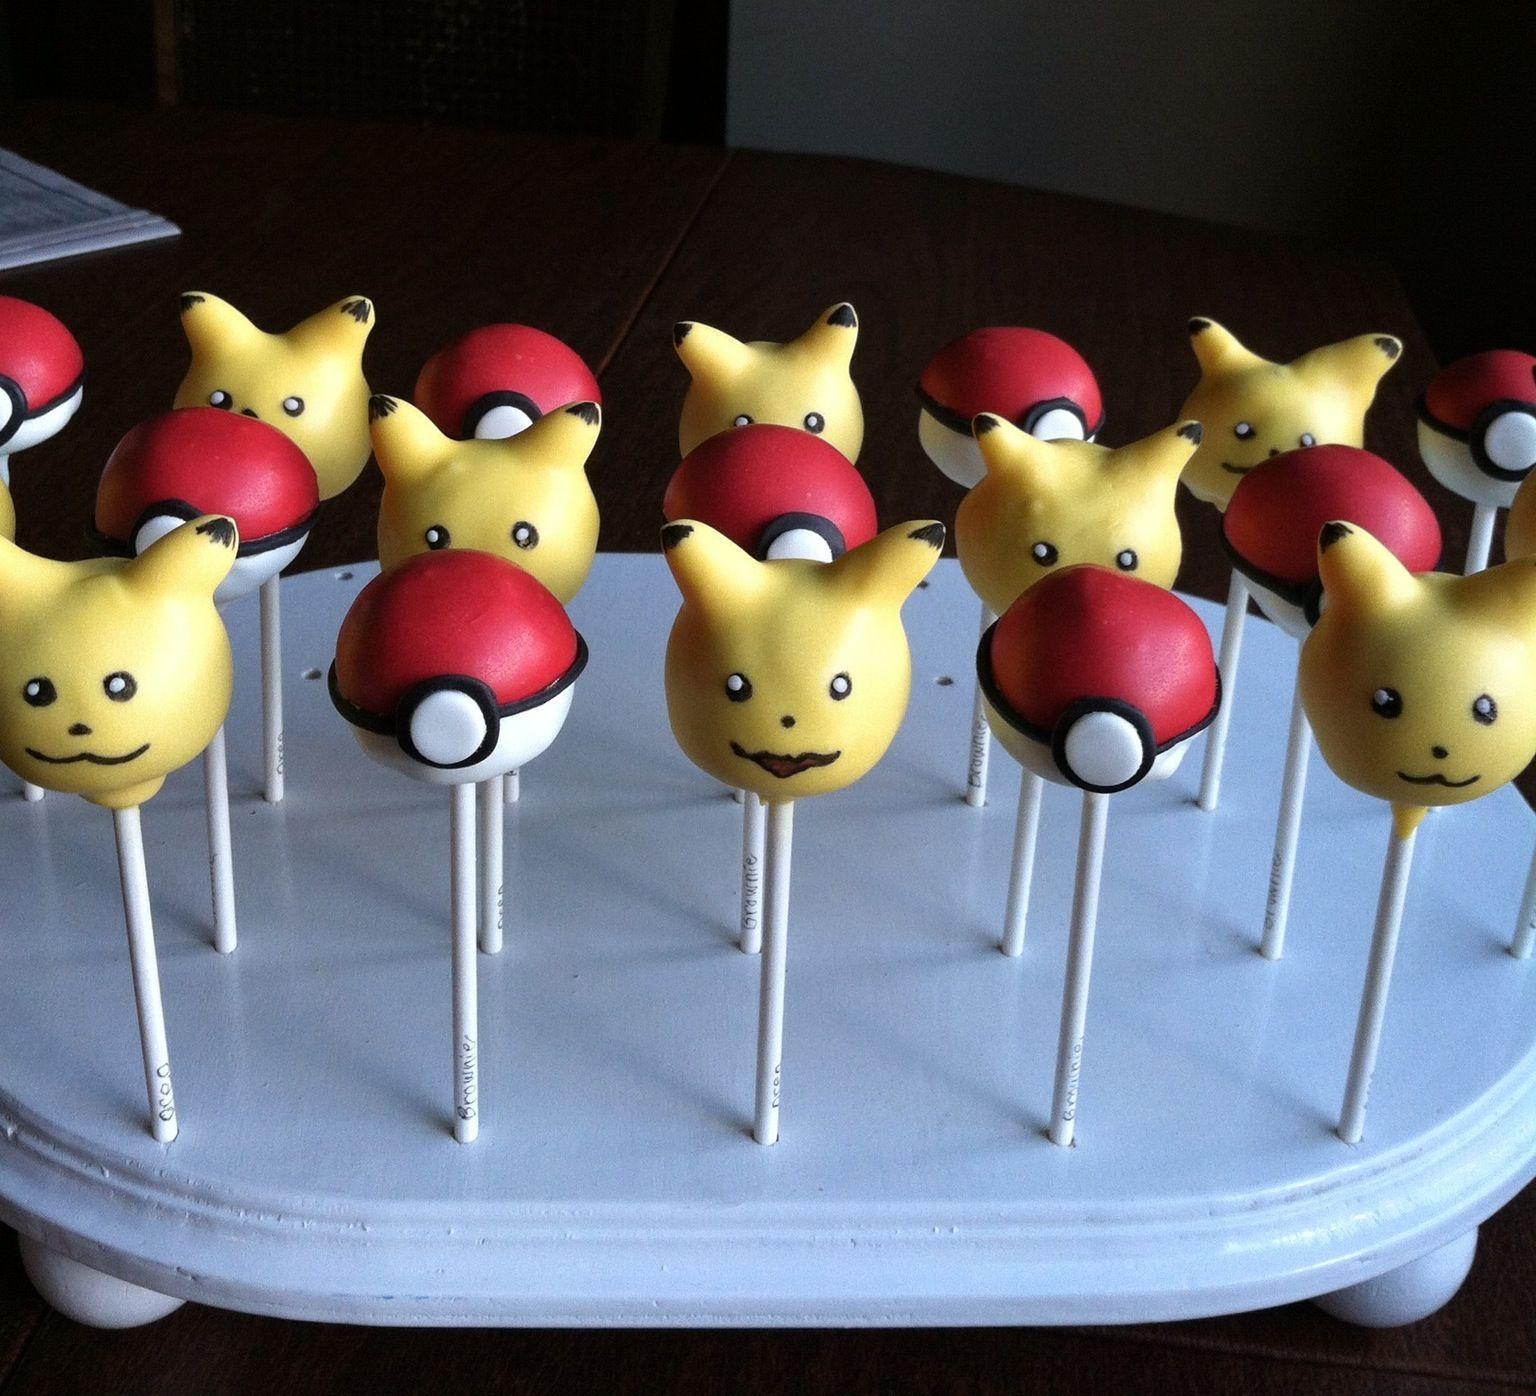 pikachu pokeballs cakepops pokemon at the college level